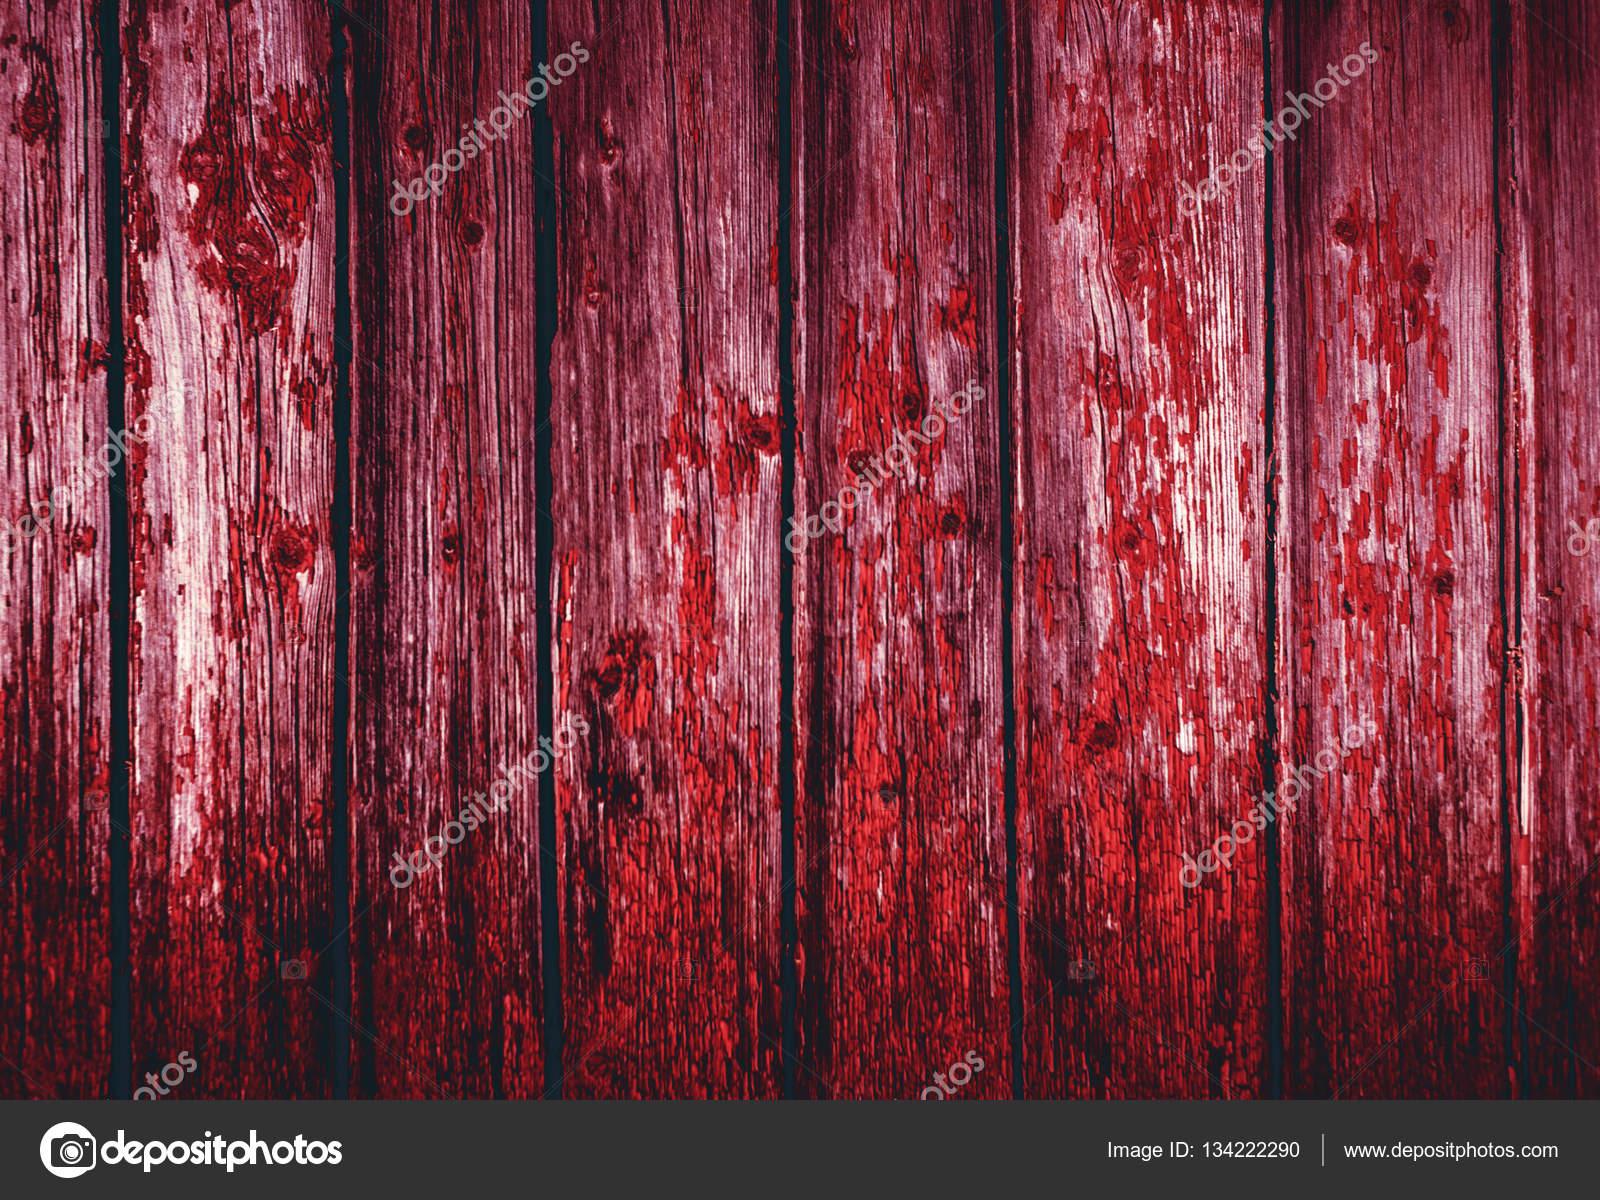 klassikko saada uutta paras palvelu Bloody wood texture | Red bloody Natural old wood texture ...